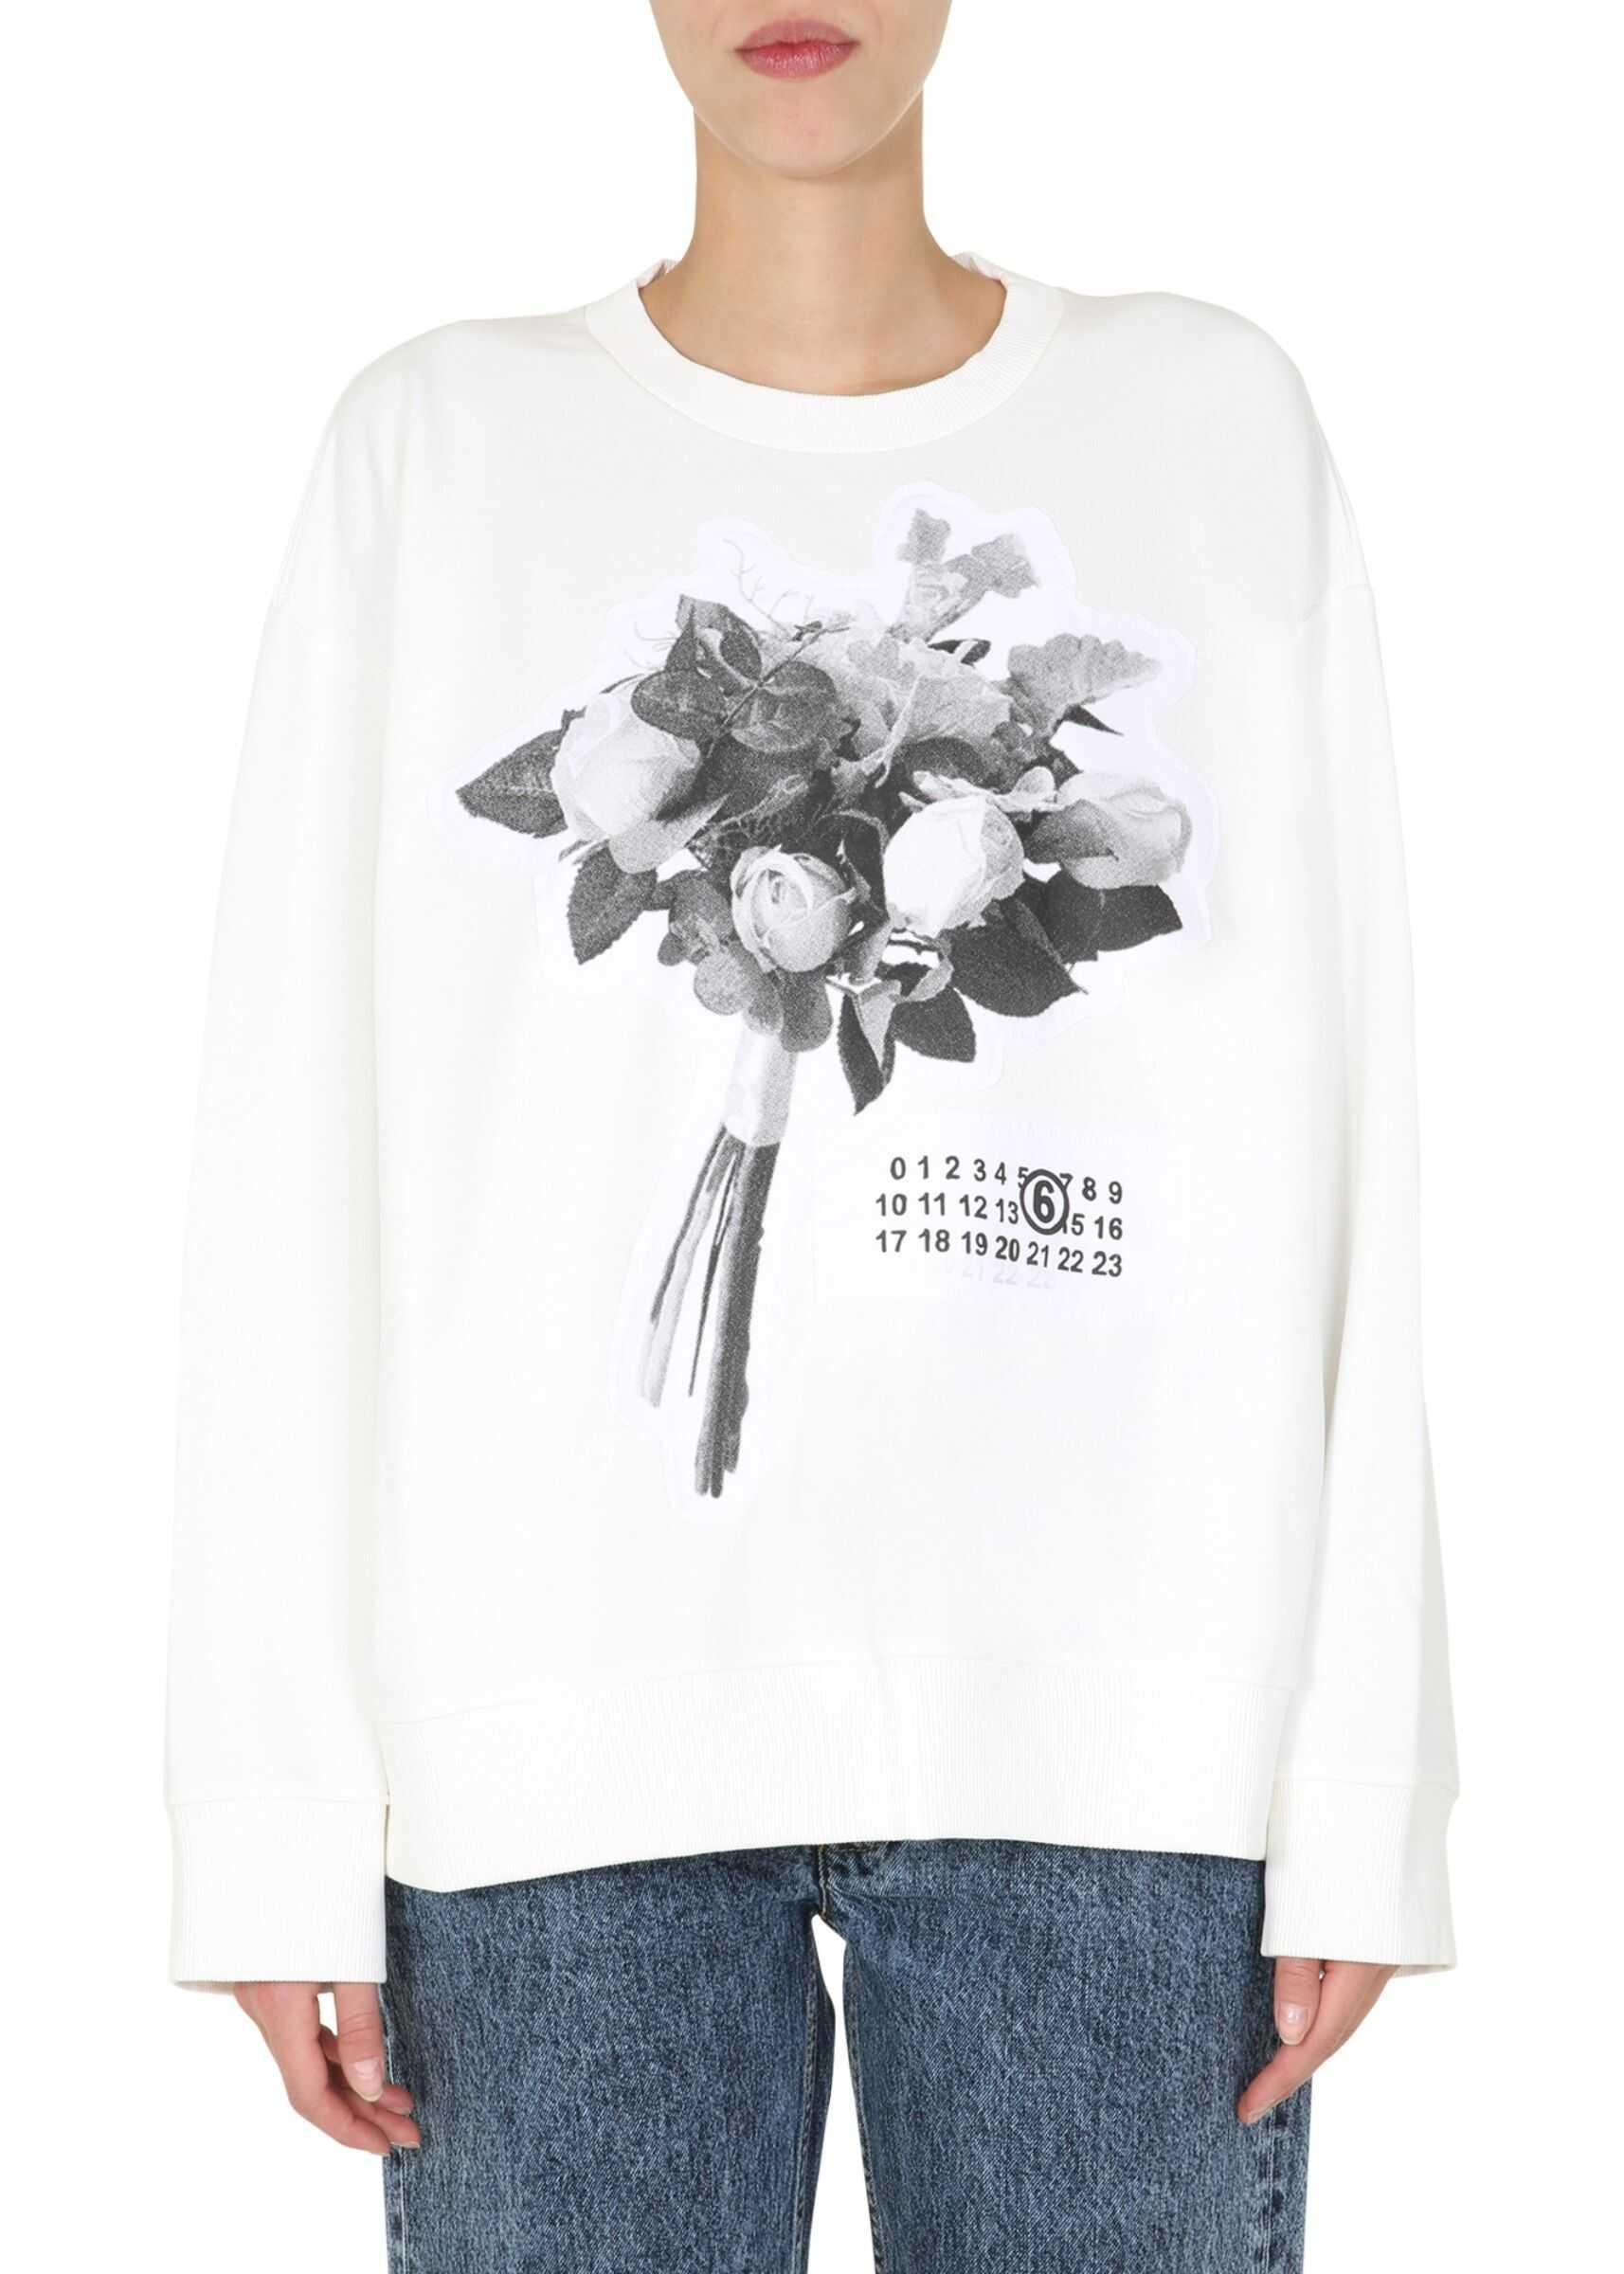 MM6 Maison Margiela Round Neck Sweatshirt WHITE